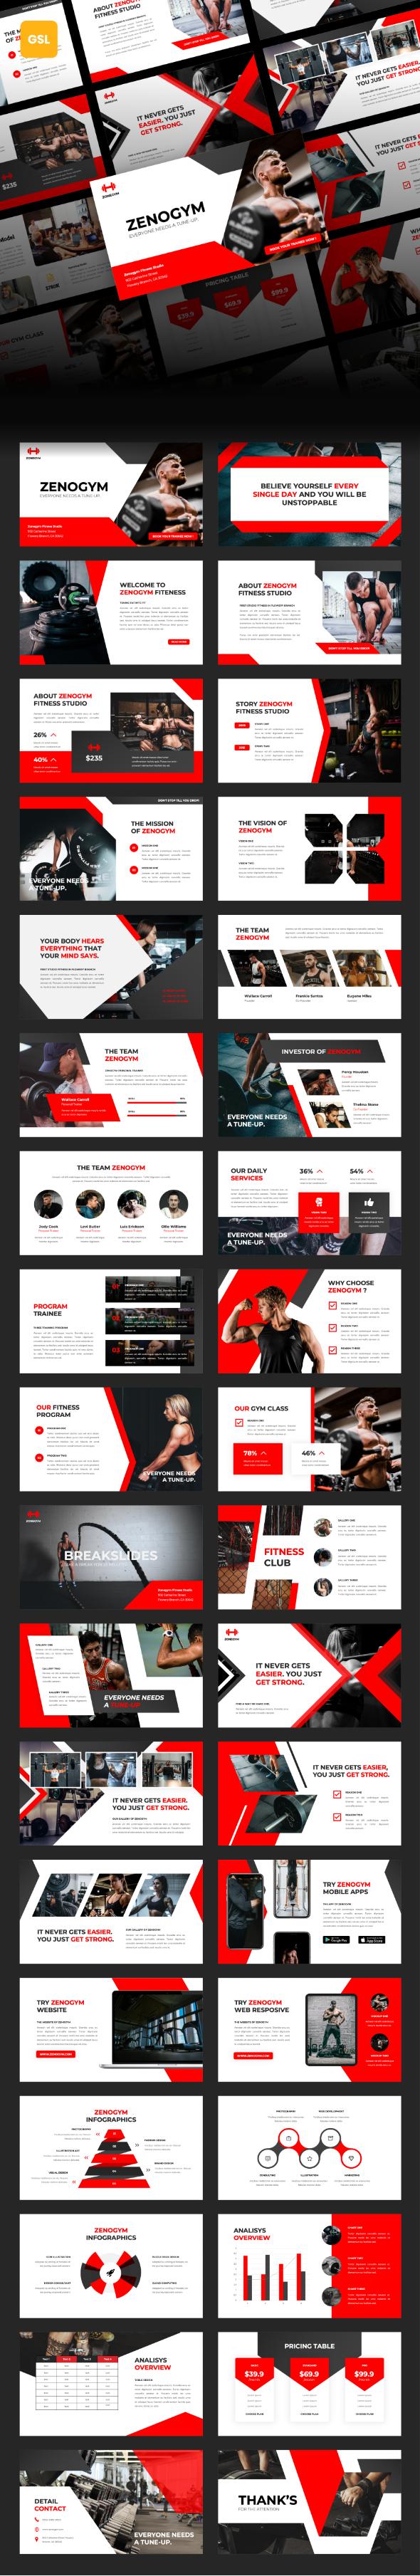 Zenogym - Fitness and Gym Google Slides Template